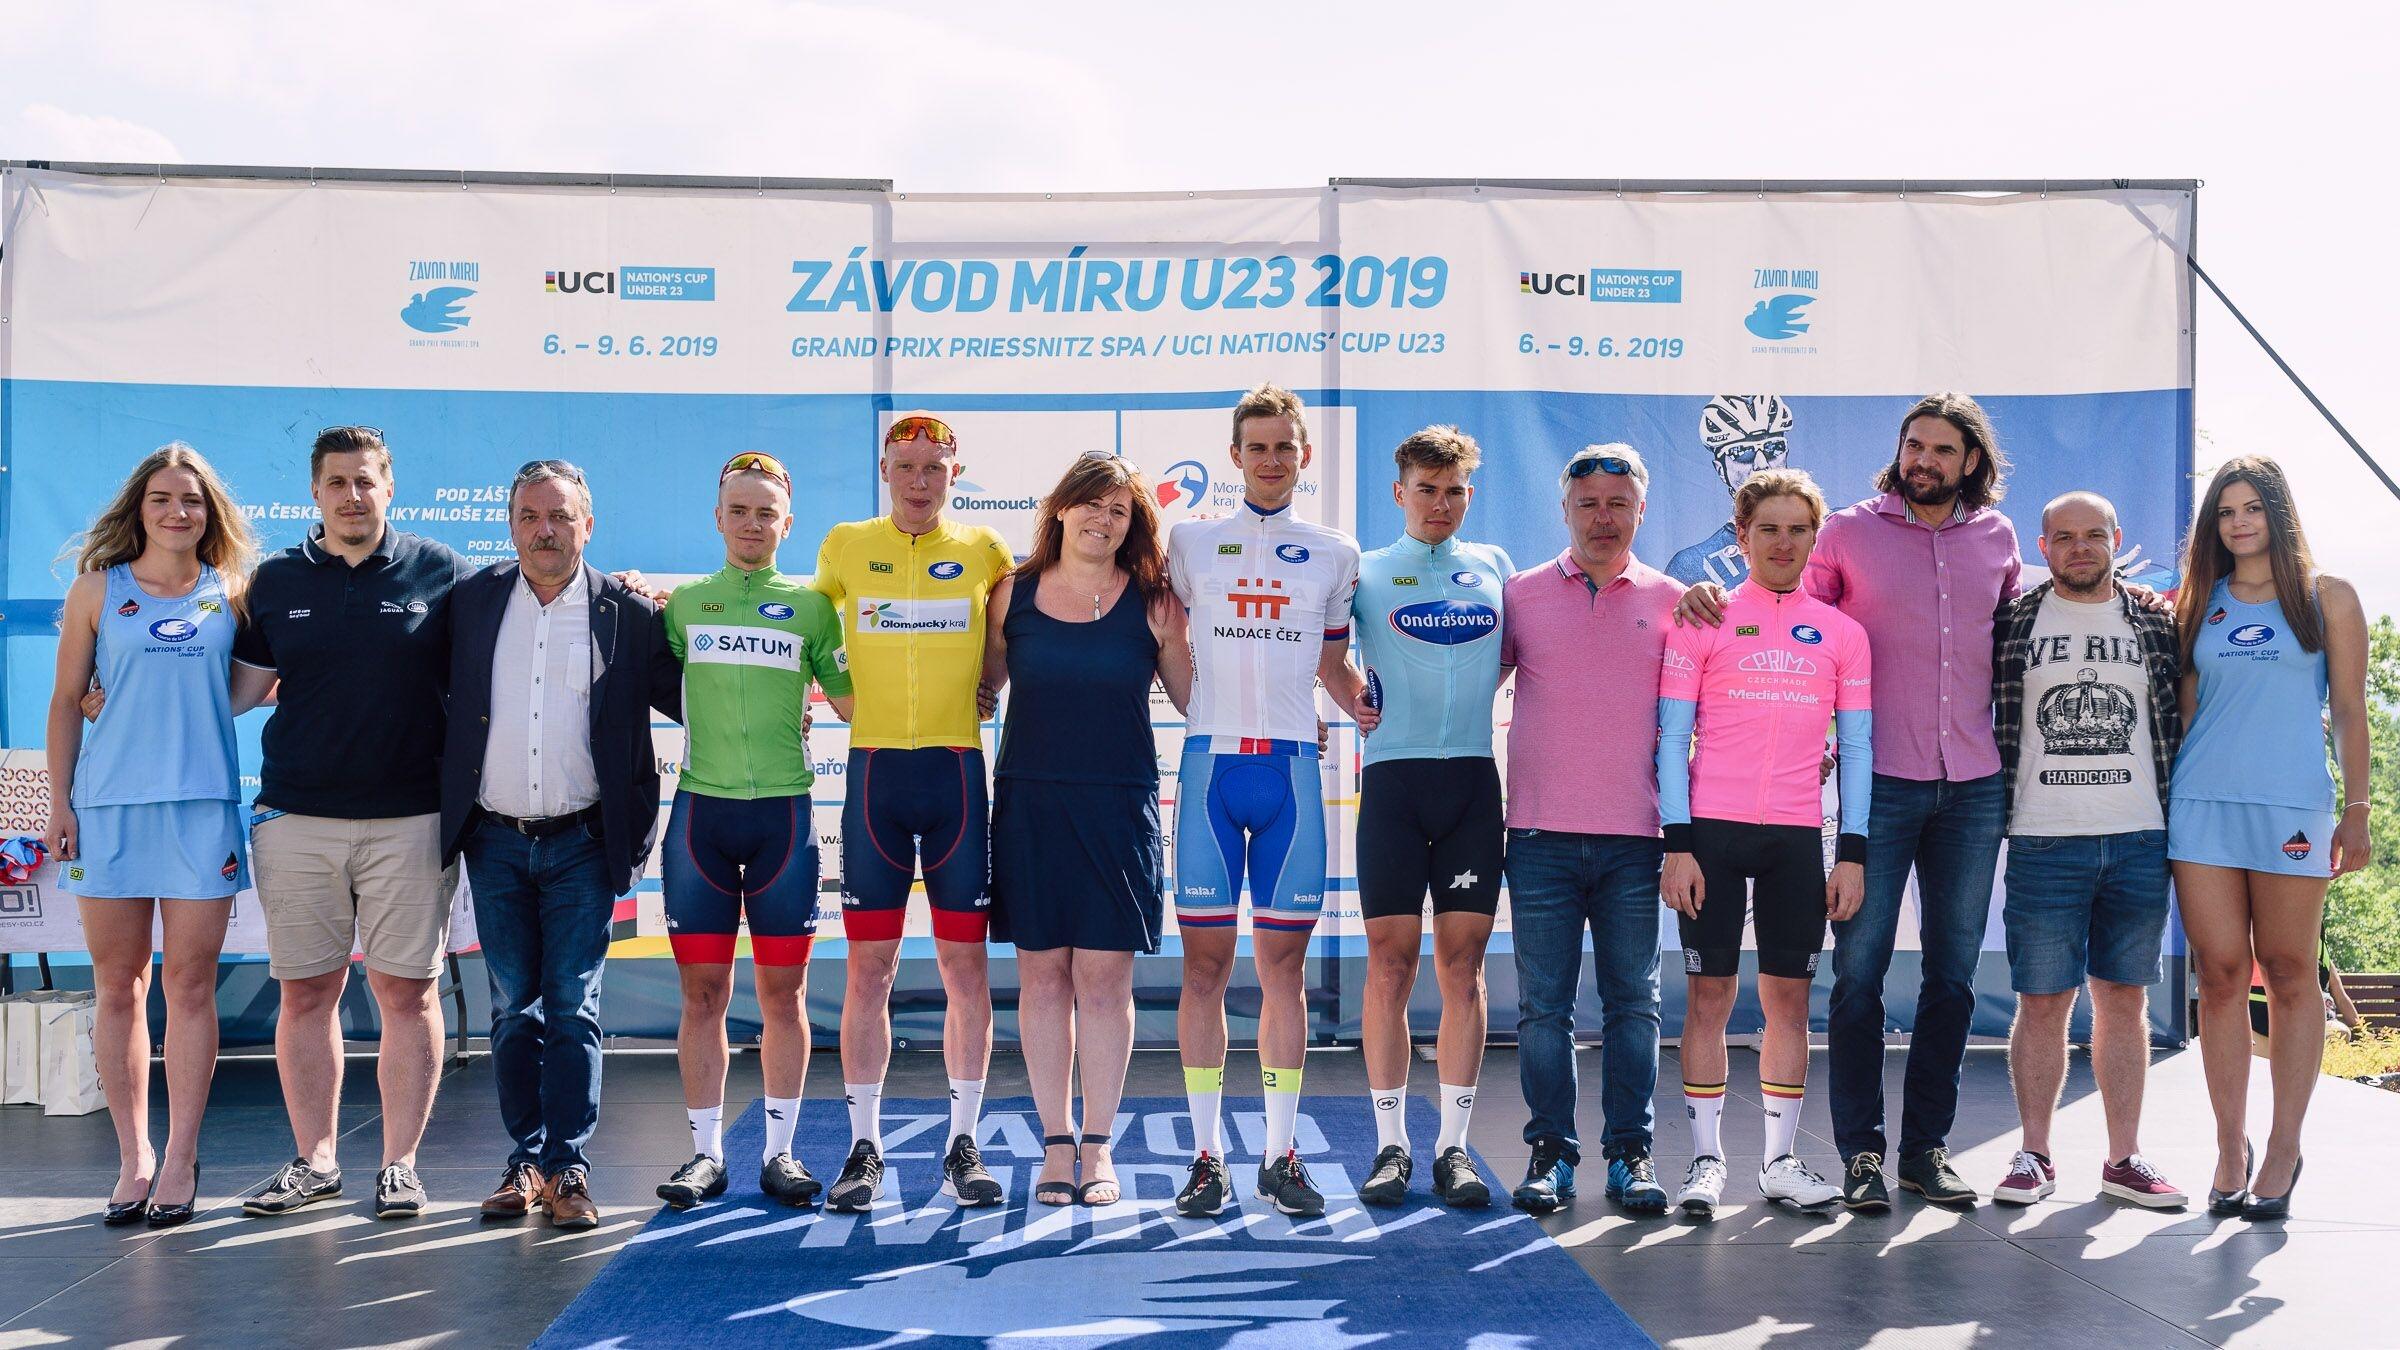 pódium foto: Jan Brychta / Závod míru U23 - jesenická cyklistika